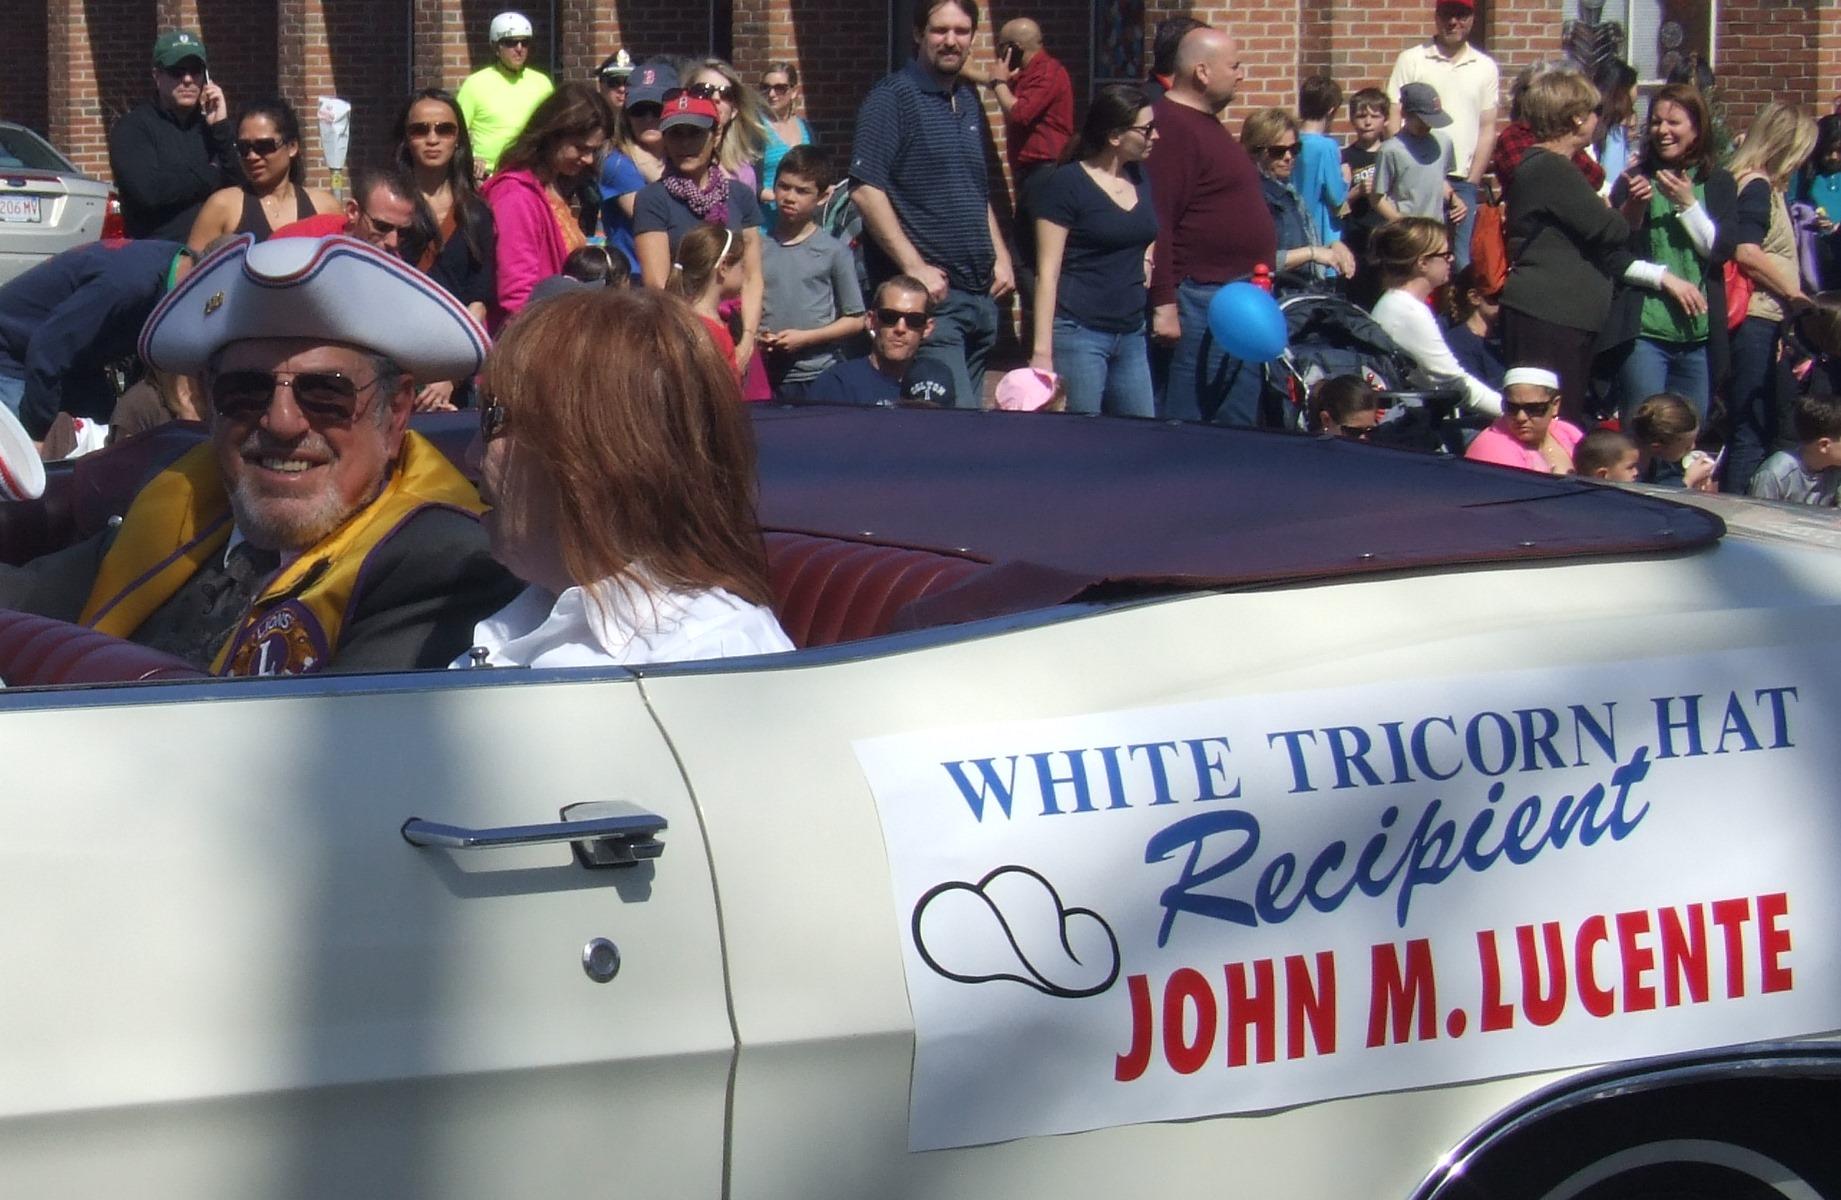 John Lucente - 2014 White Tricorne Hat Recipient